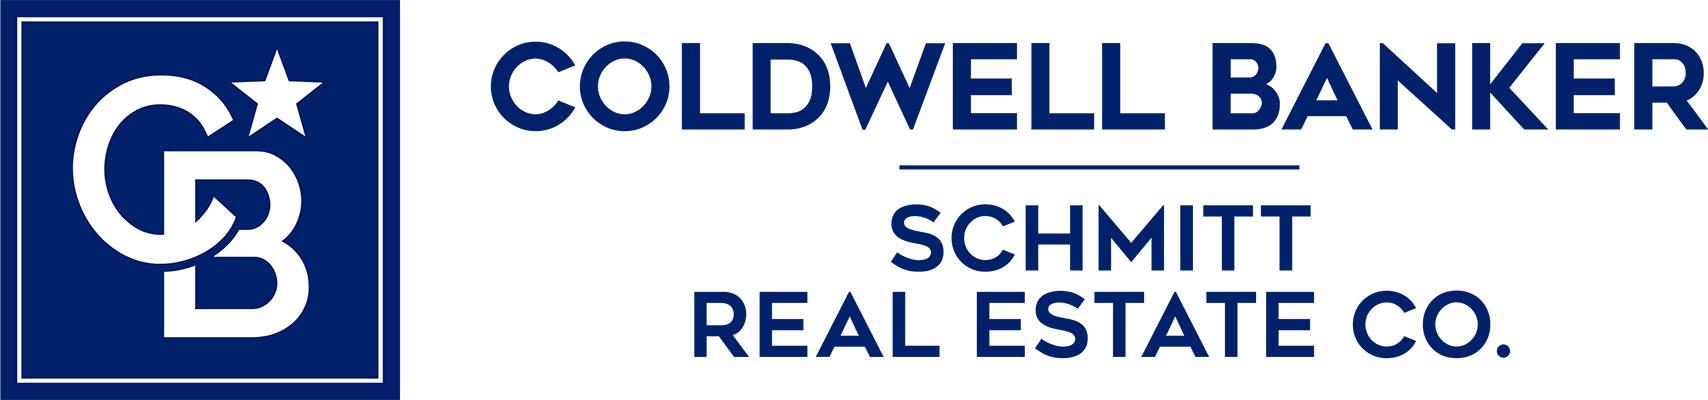 Karen Prince - Coldwell Banker Logo